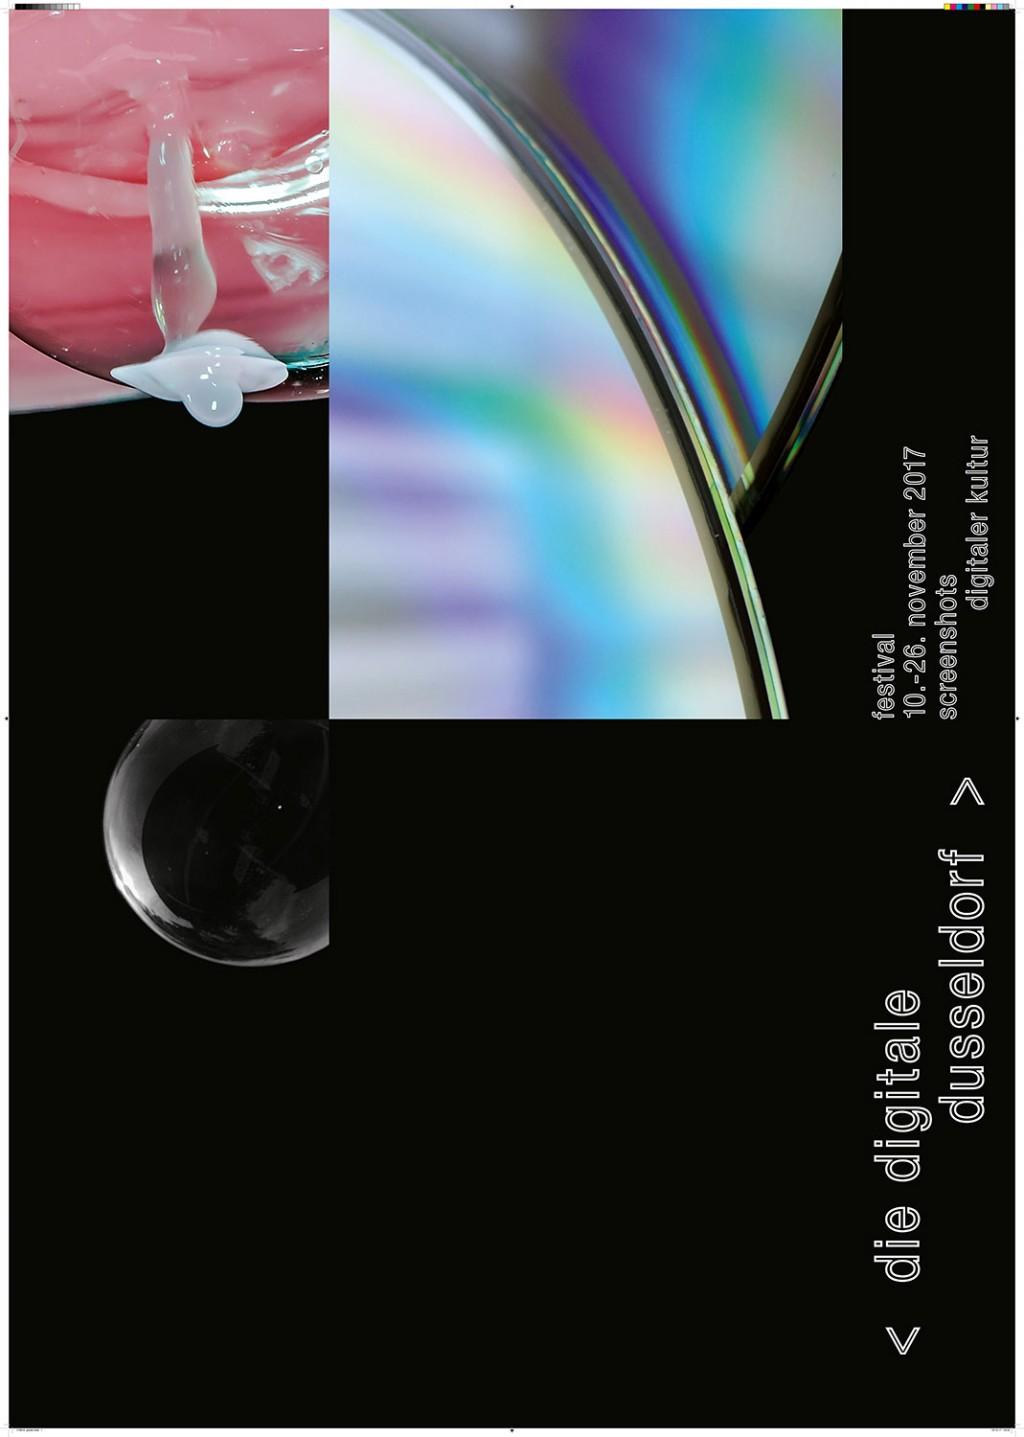 Kaja Poestges die digitale dusseldorf 17 – identity